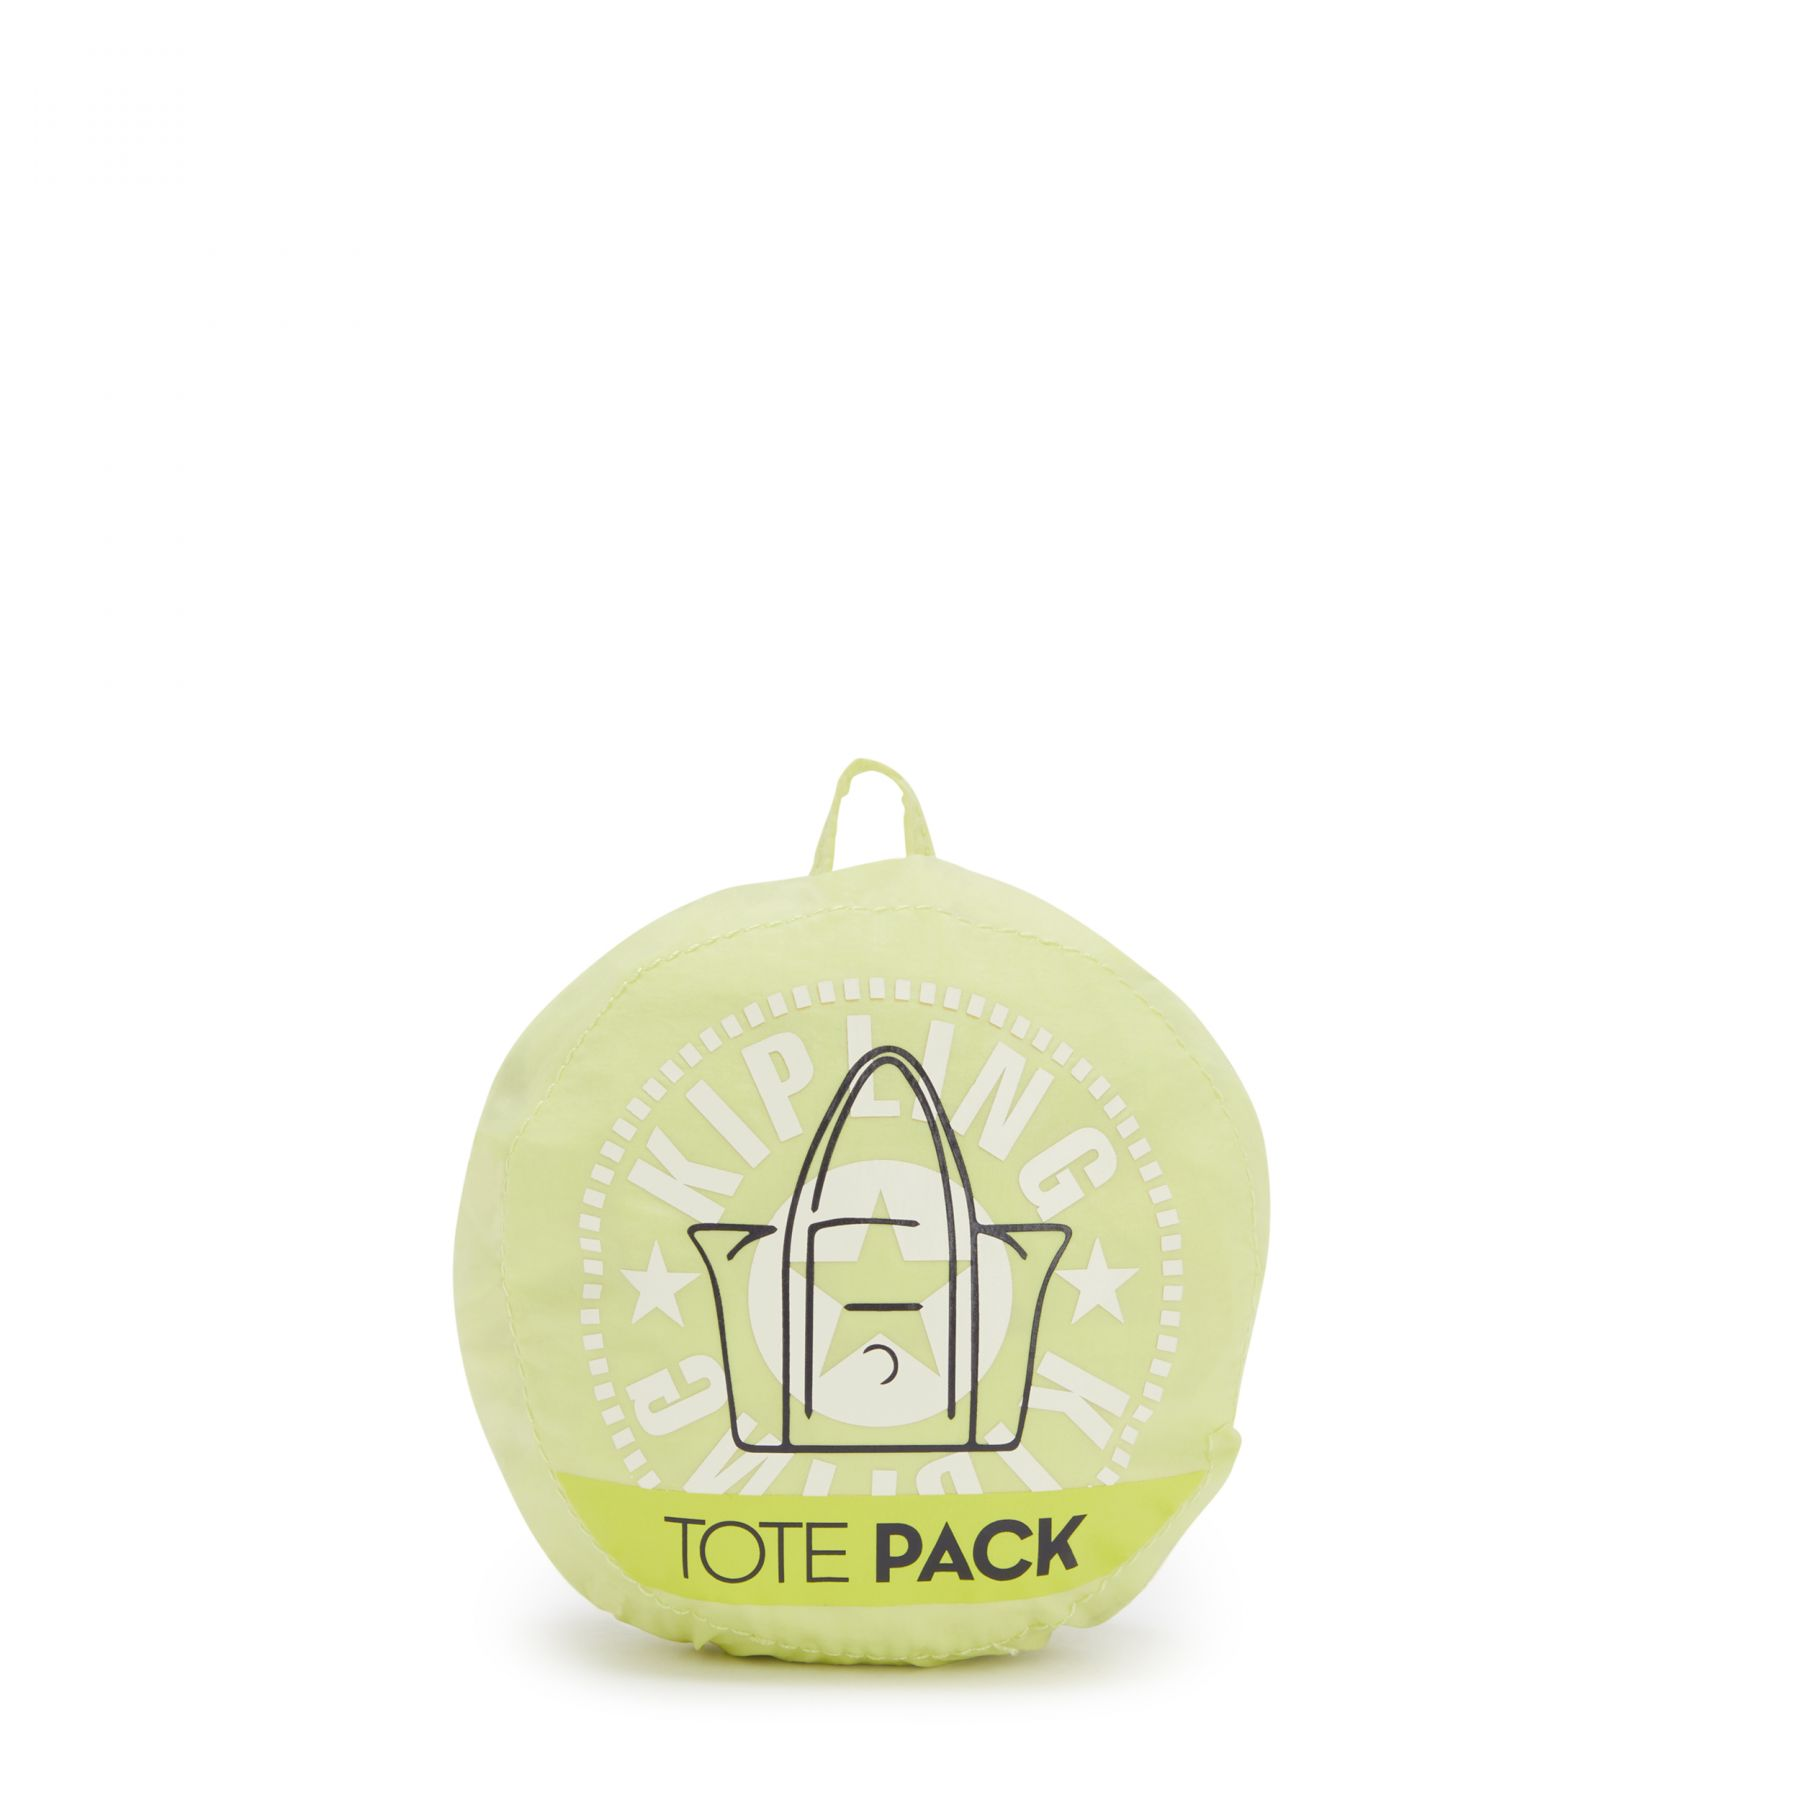 TOTE PACK Kipling | Accessori | TOTEPACKLIMEGREEN